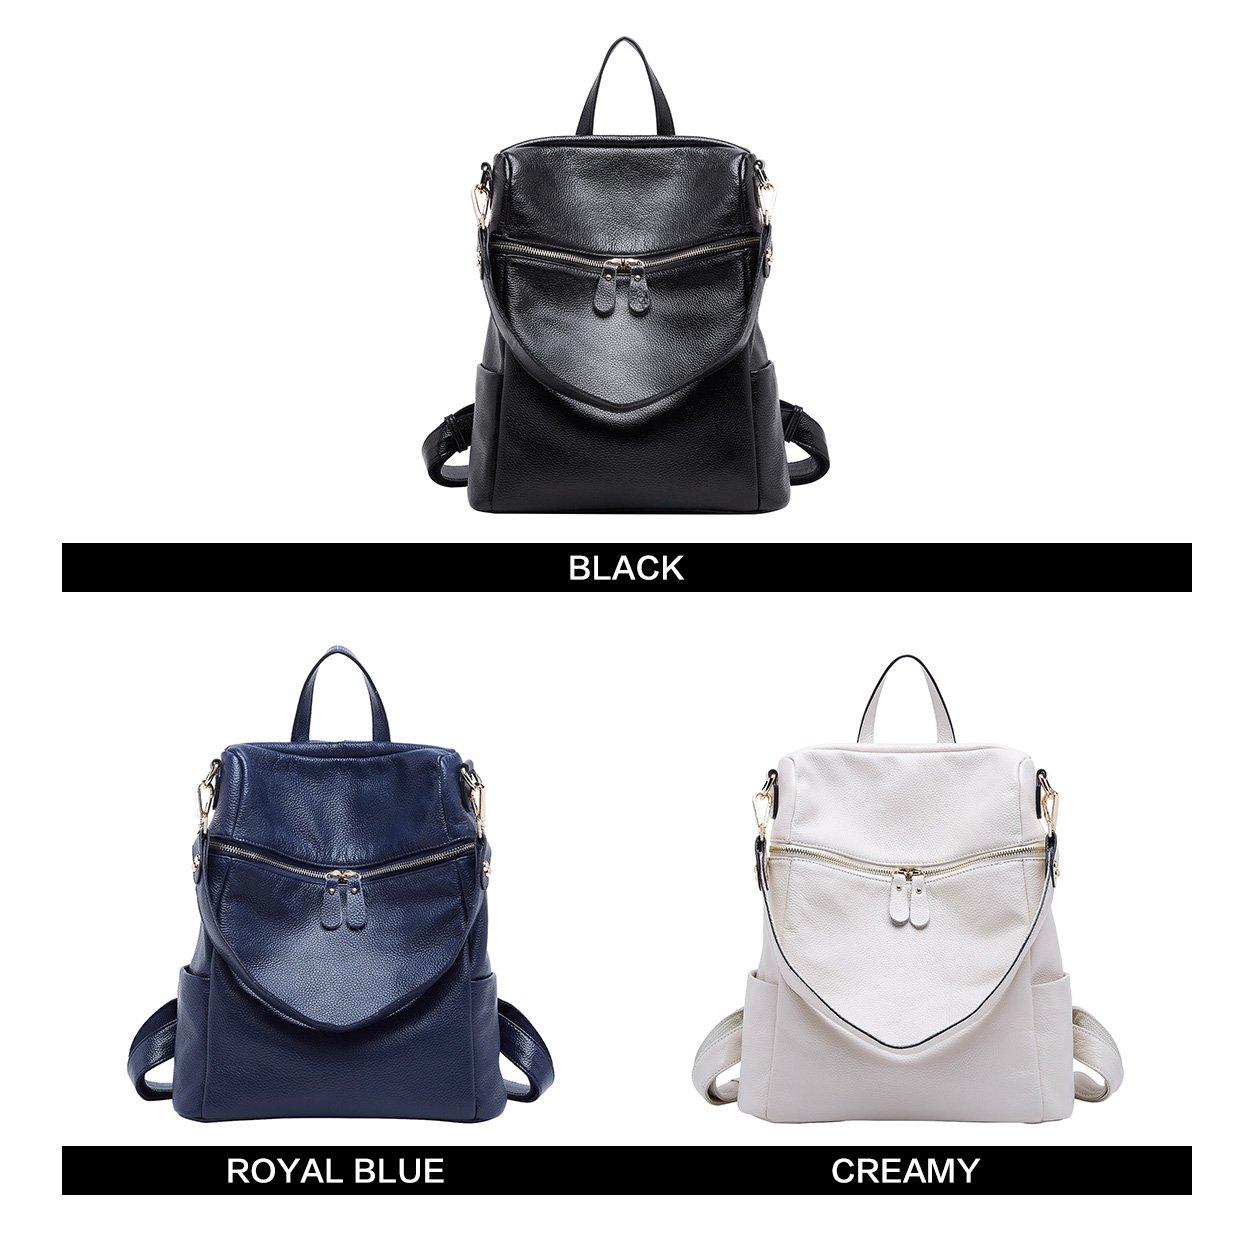 BOYATU Convertible Genuine Leather Backpack Purse for Women Fashion Travel Bag (Black) by BOYATU (Image #9)